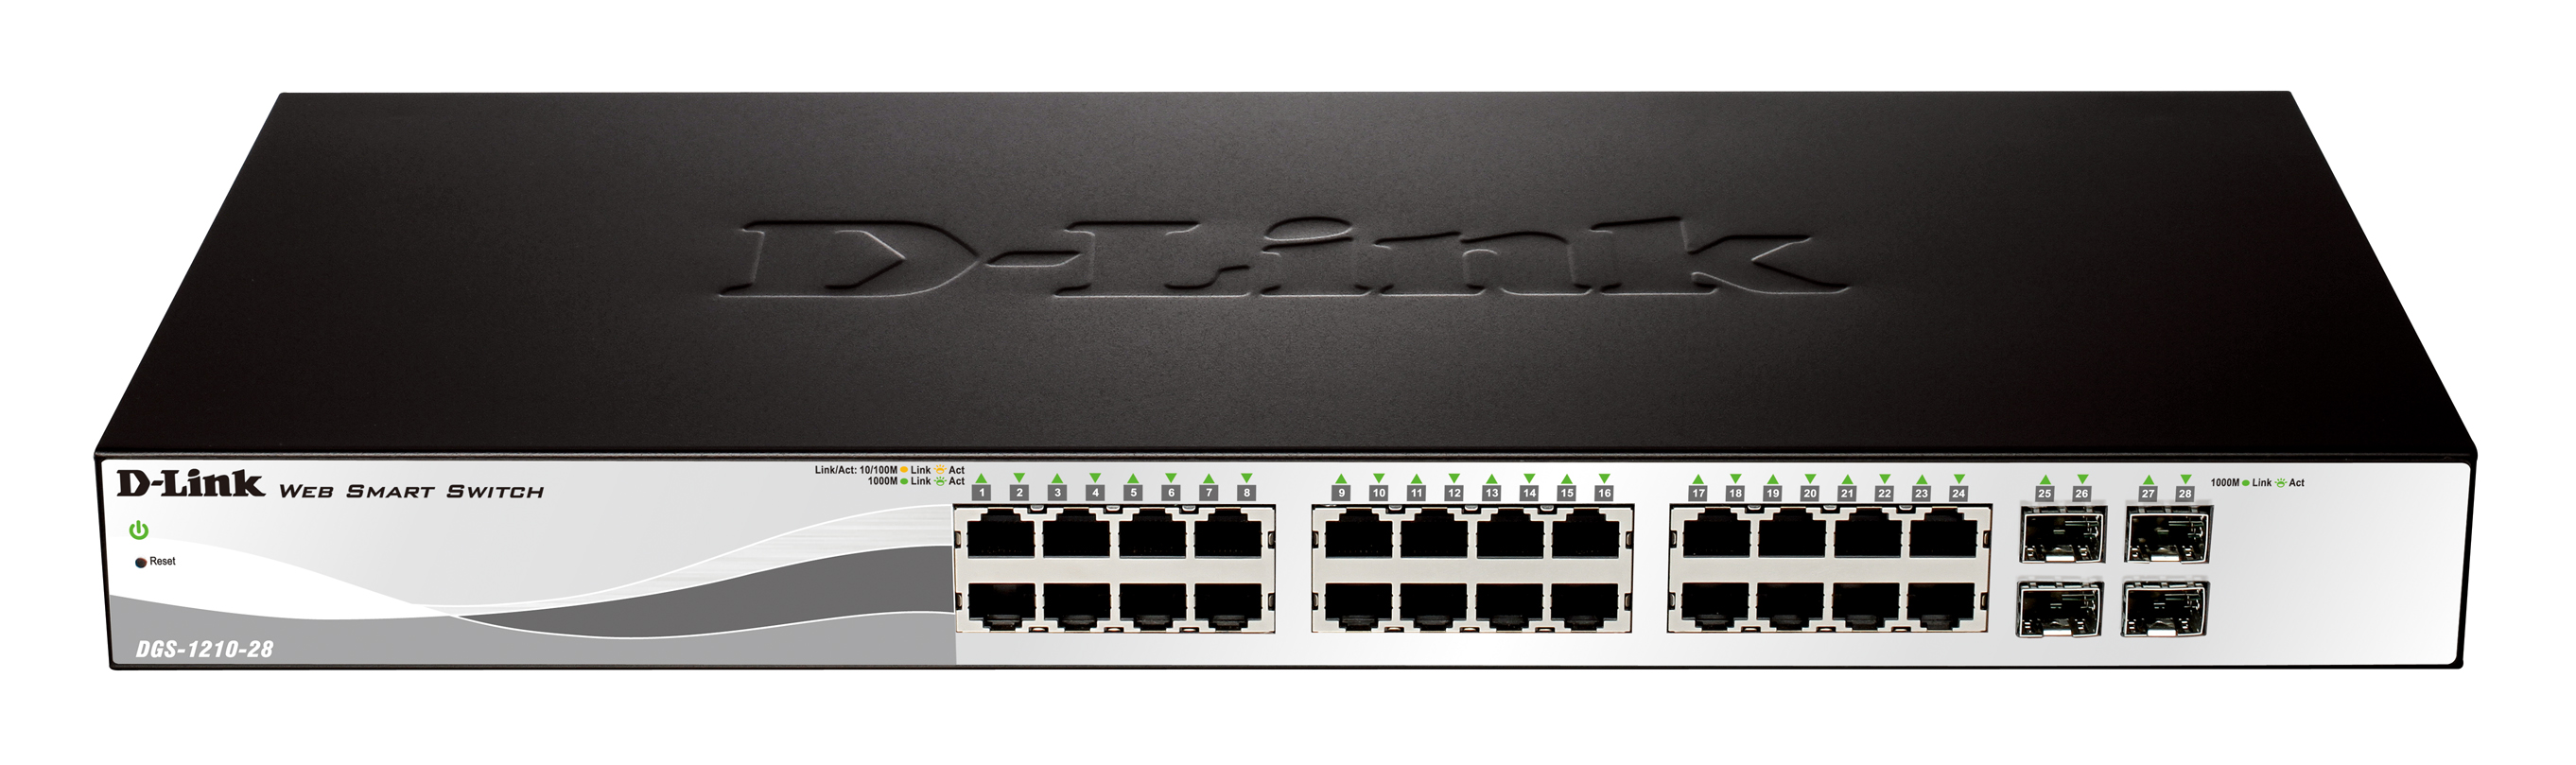 D-Link DGS-1500-52 Drivers Windows